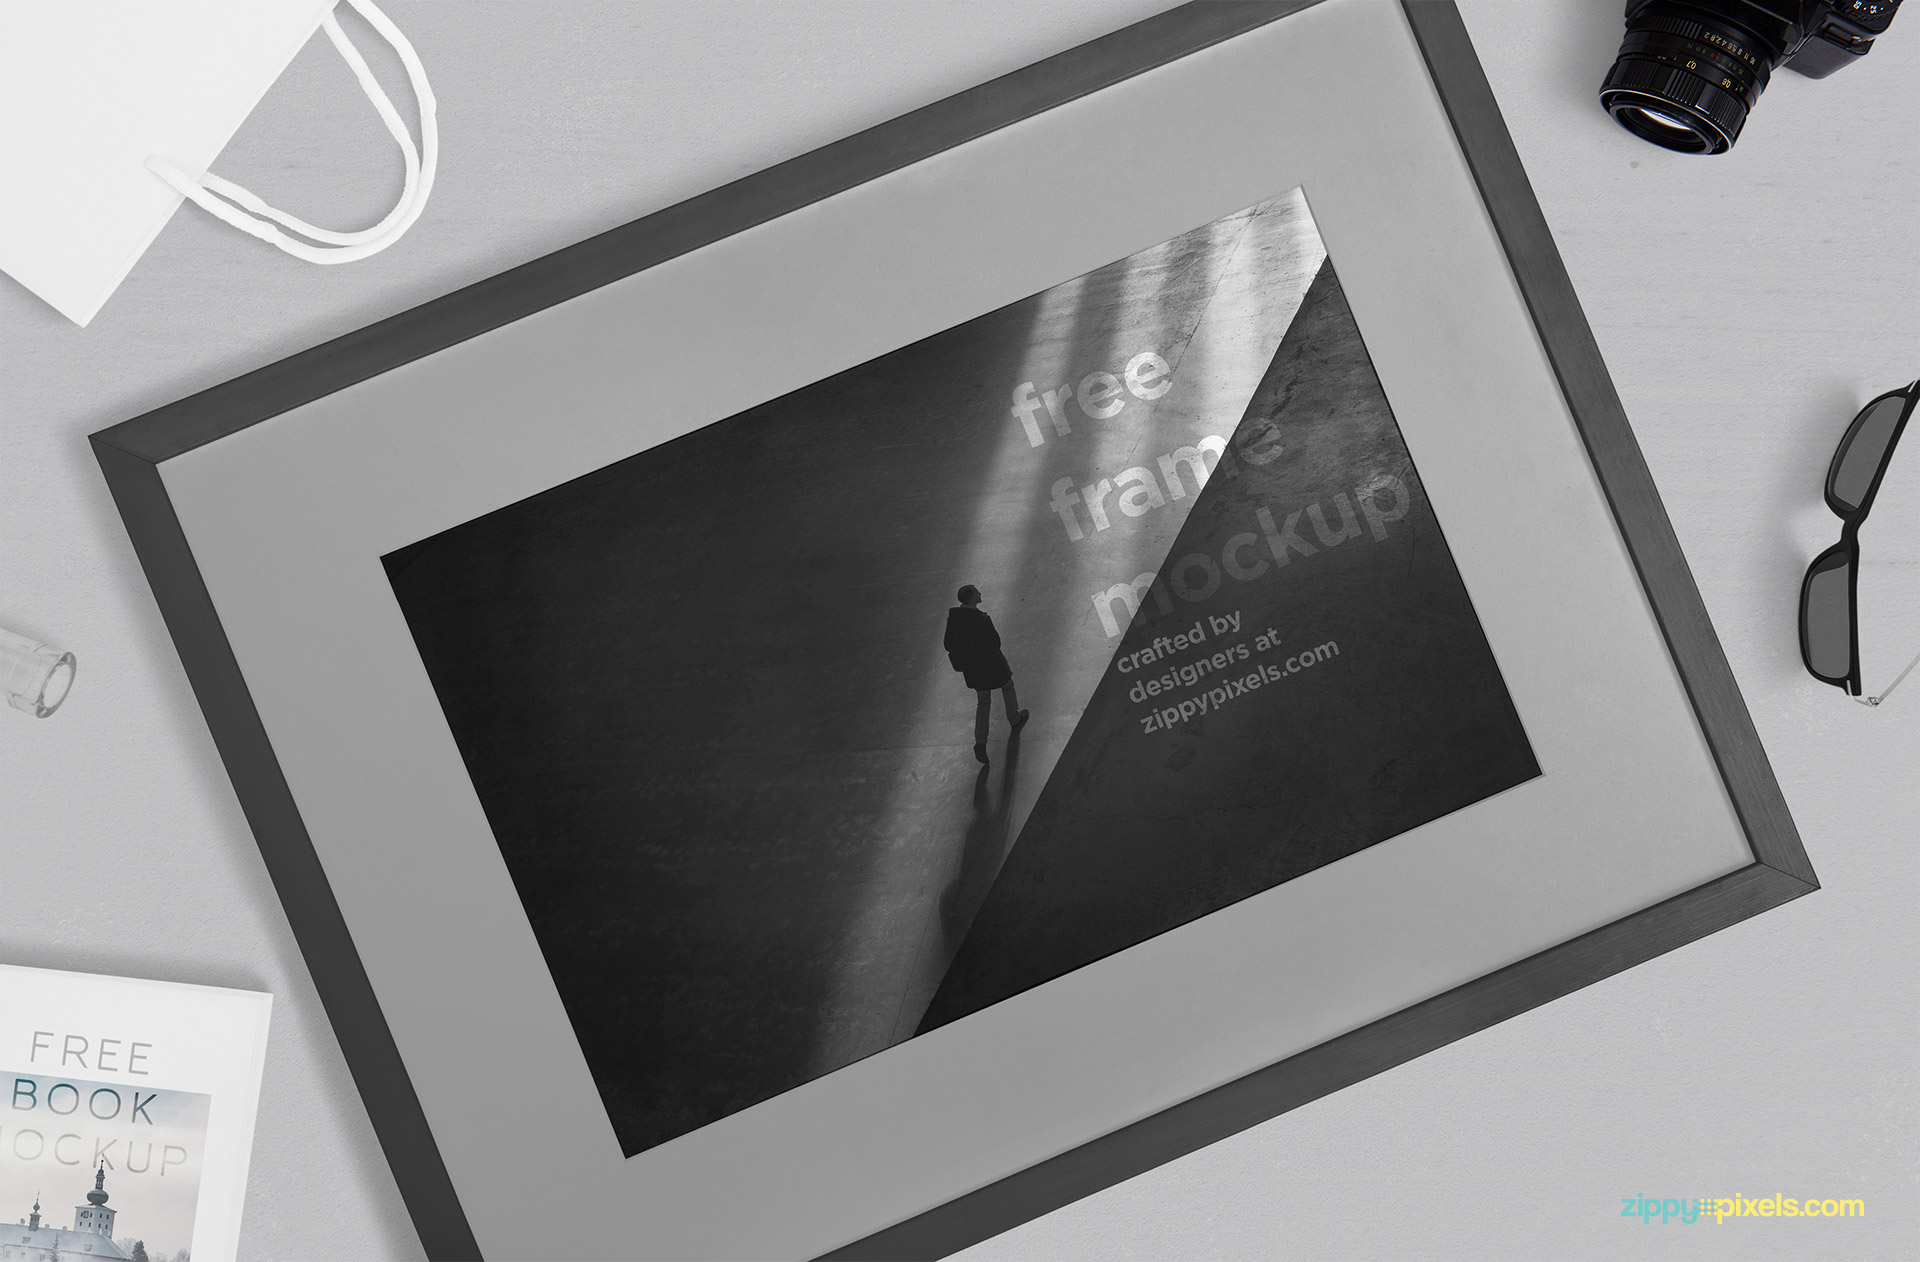 Free frame mockup by ZippyPixels.